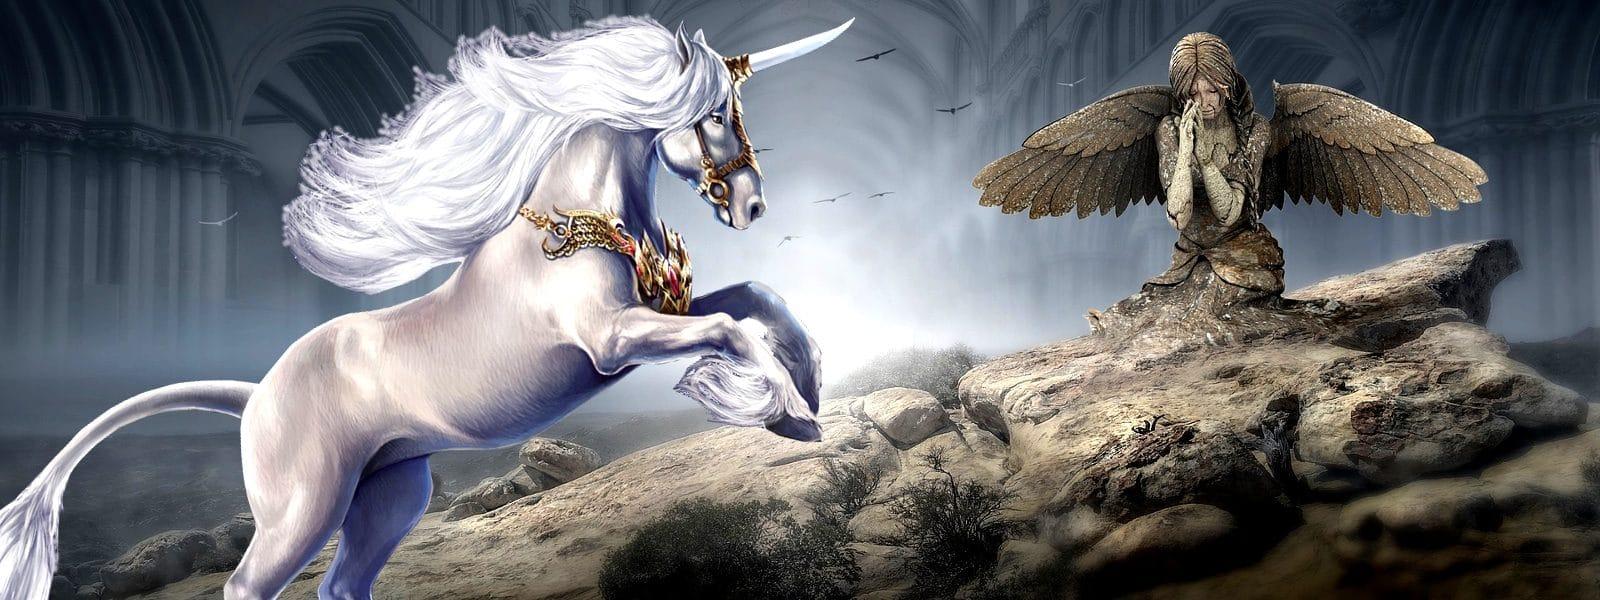 Licorne Mythologie la croyance populaire